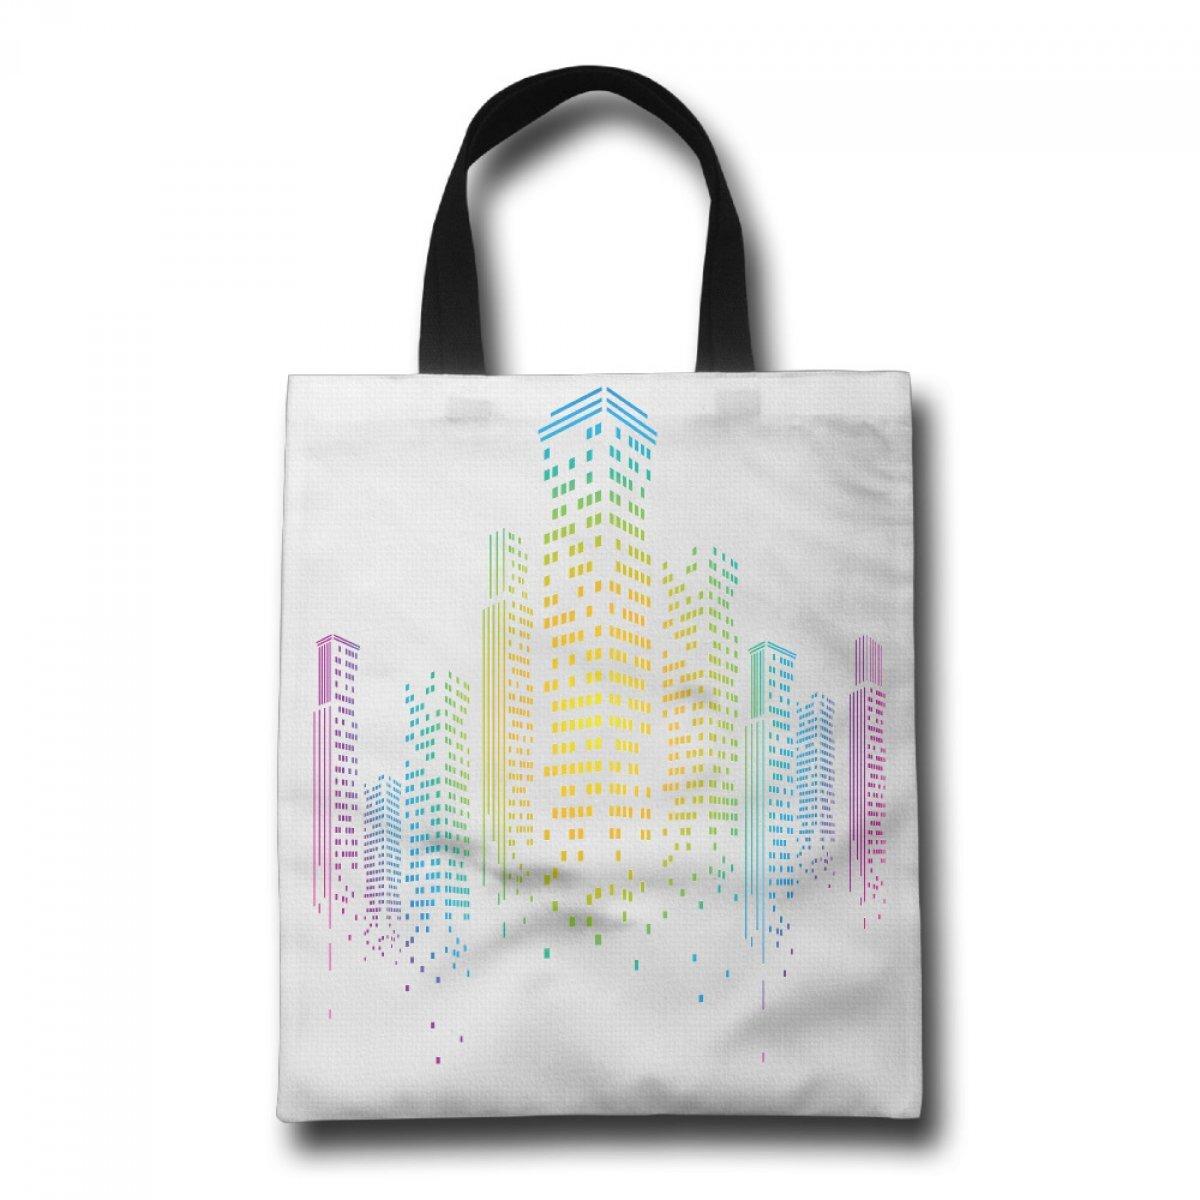 PhoRock Women Beach Tote High-Rise Building Printed Canvas Tote Bag GWJZ003 0